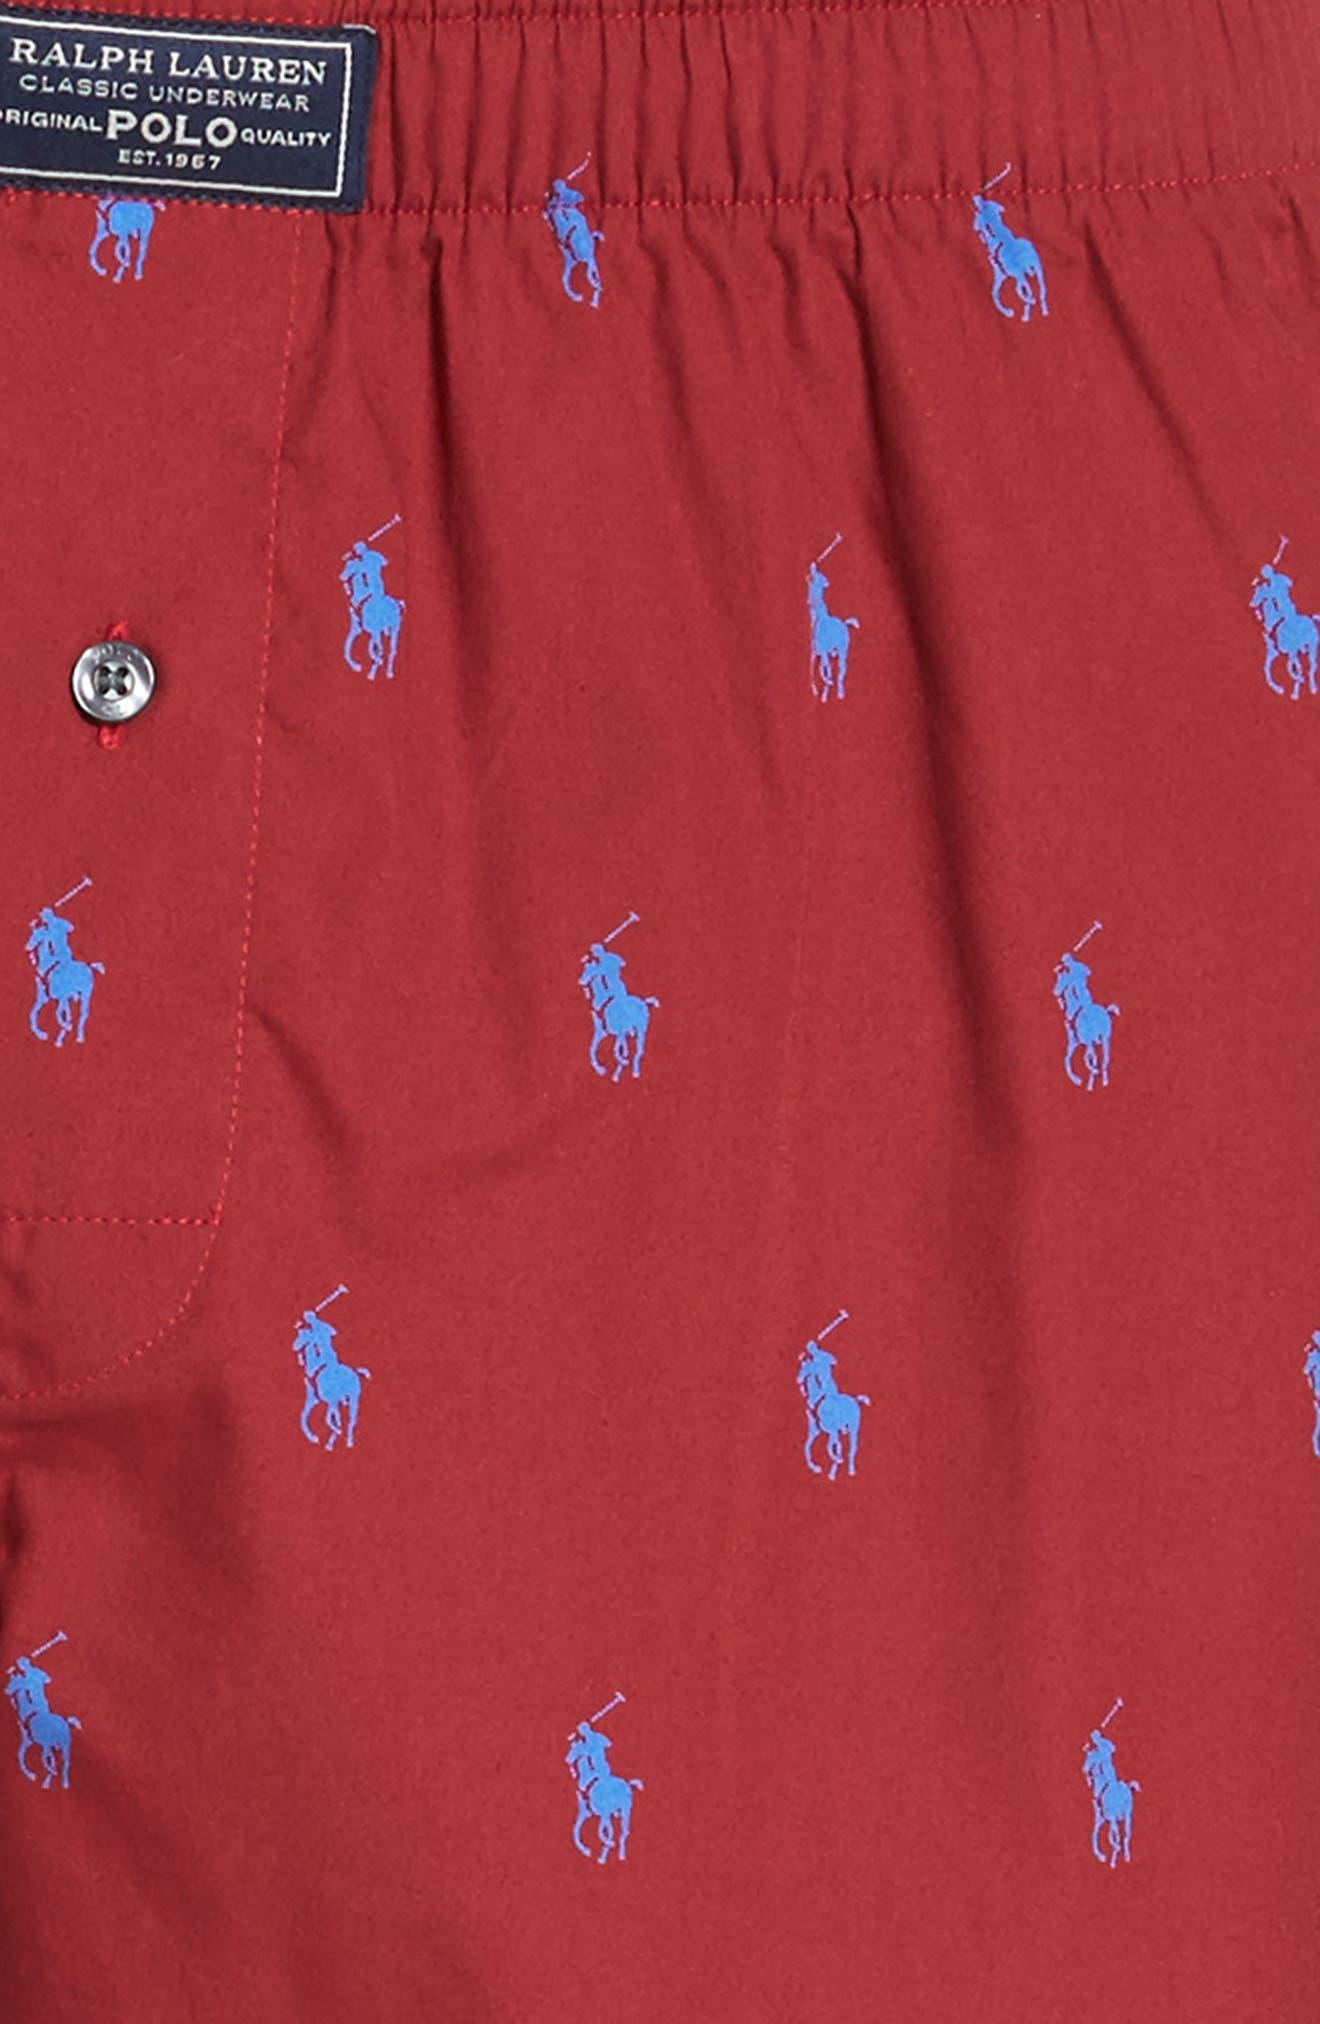 Pony Cotton Boxers,                             Alternate thumbnail 27, color,